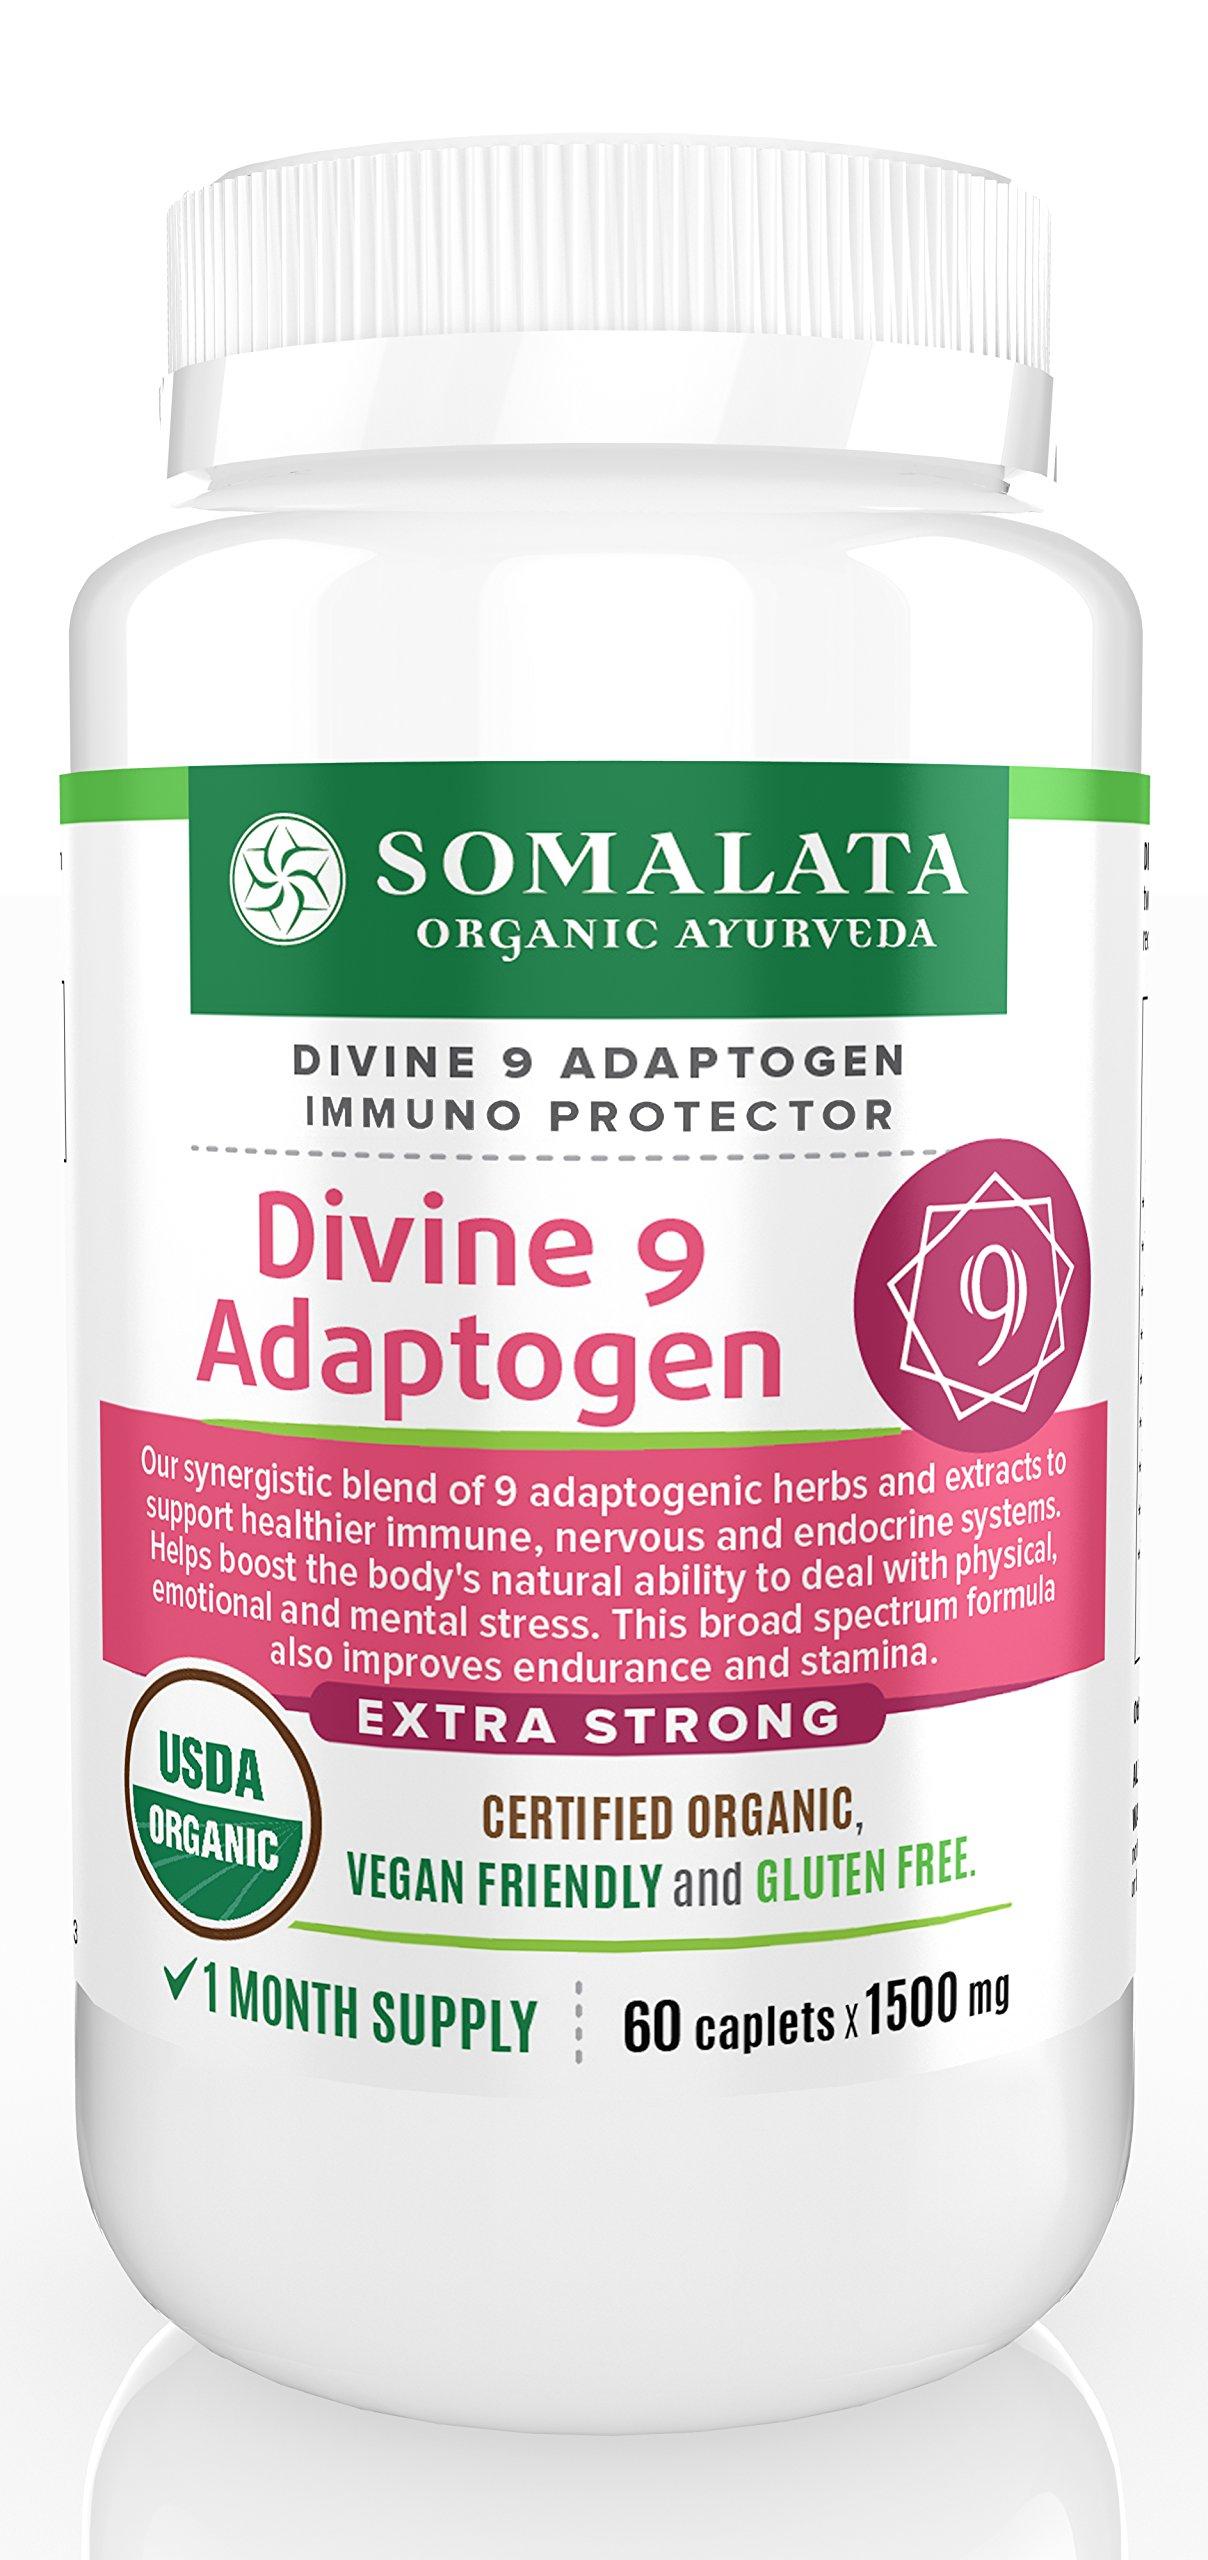 Divine 9 Adaptogen - Herbal Adrenal Support - Immune System Boost - Organic - 1500 mg